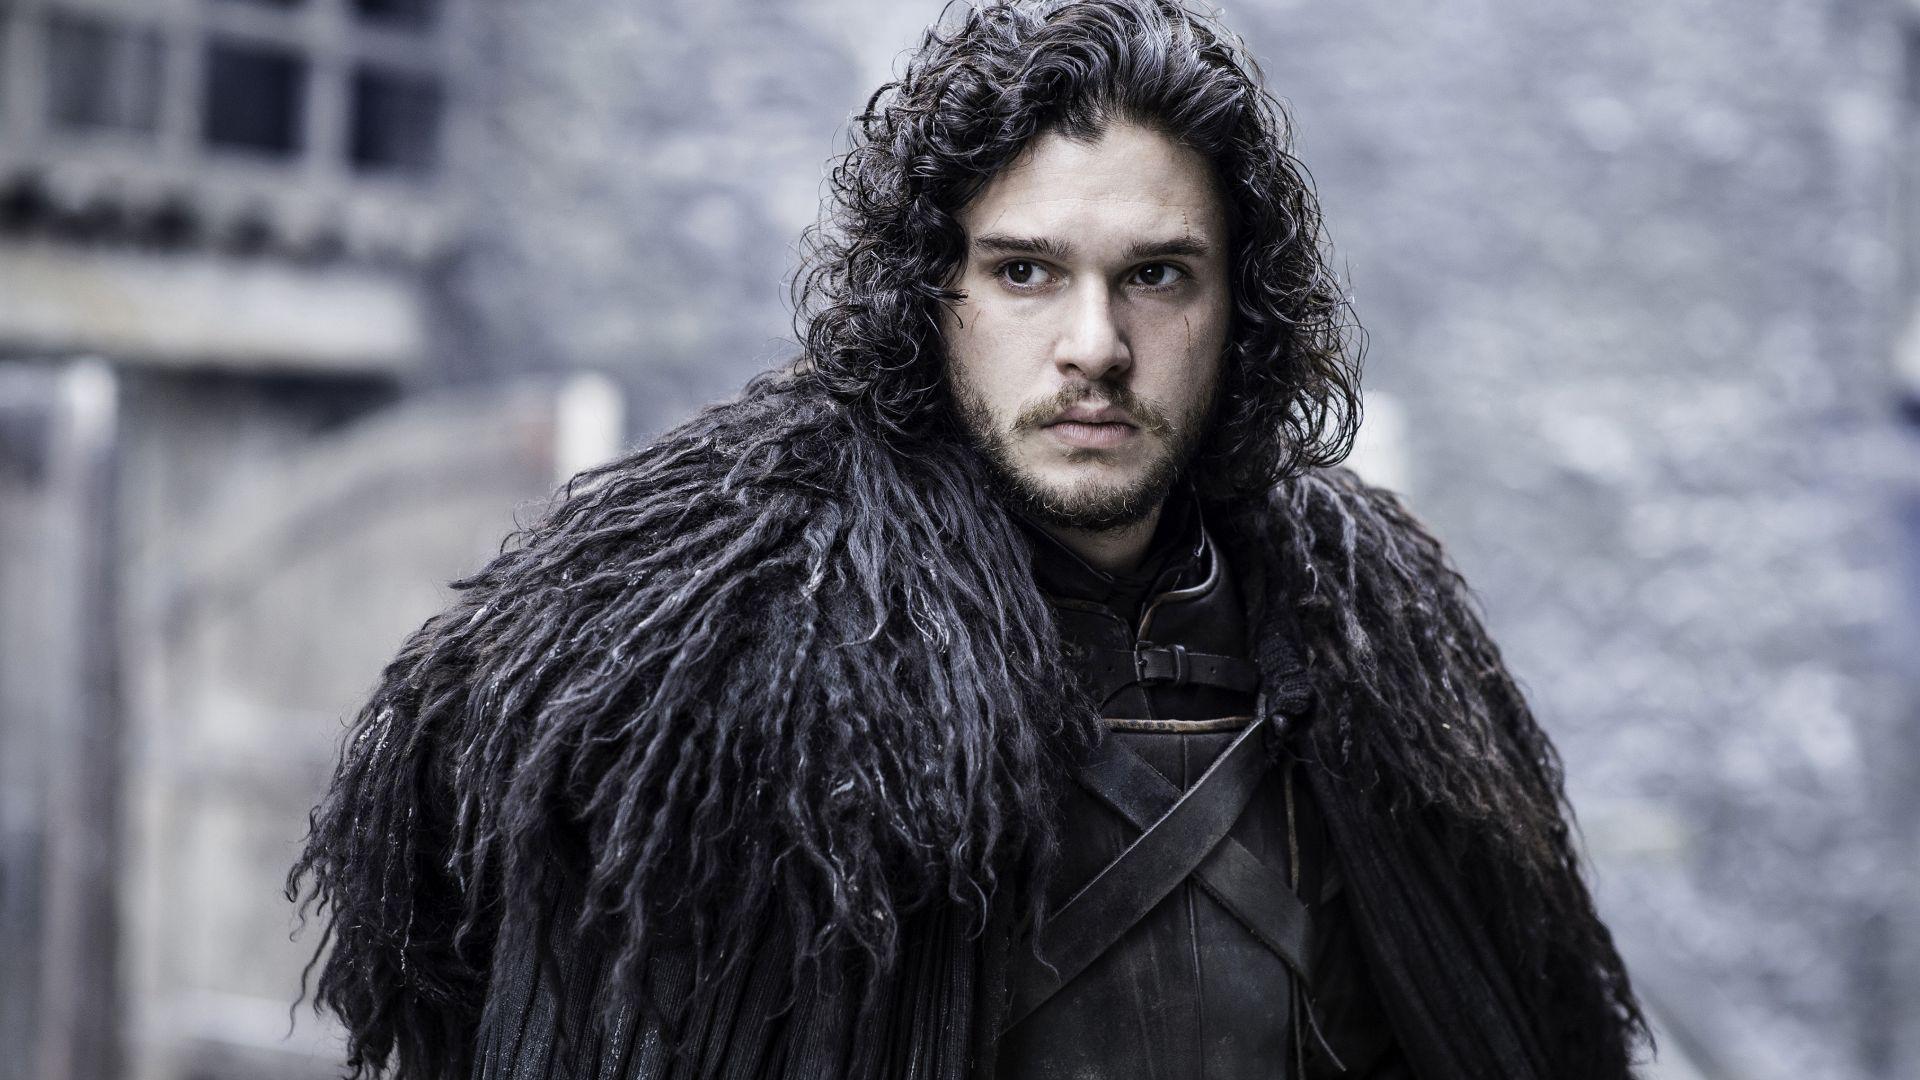 Wallpaper Kit Harington as Jon Snow of game of thrones